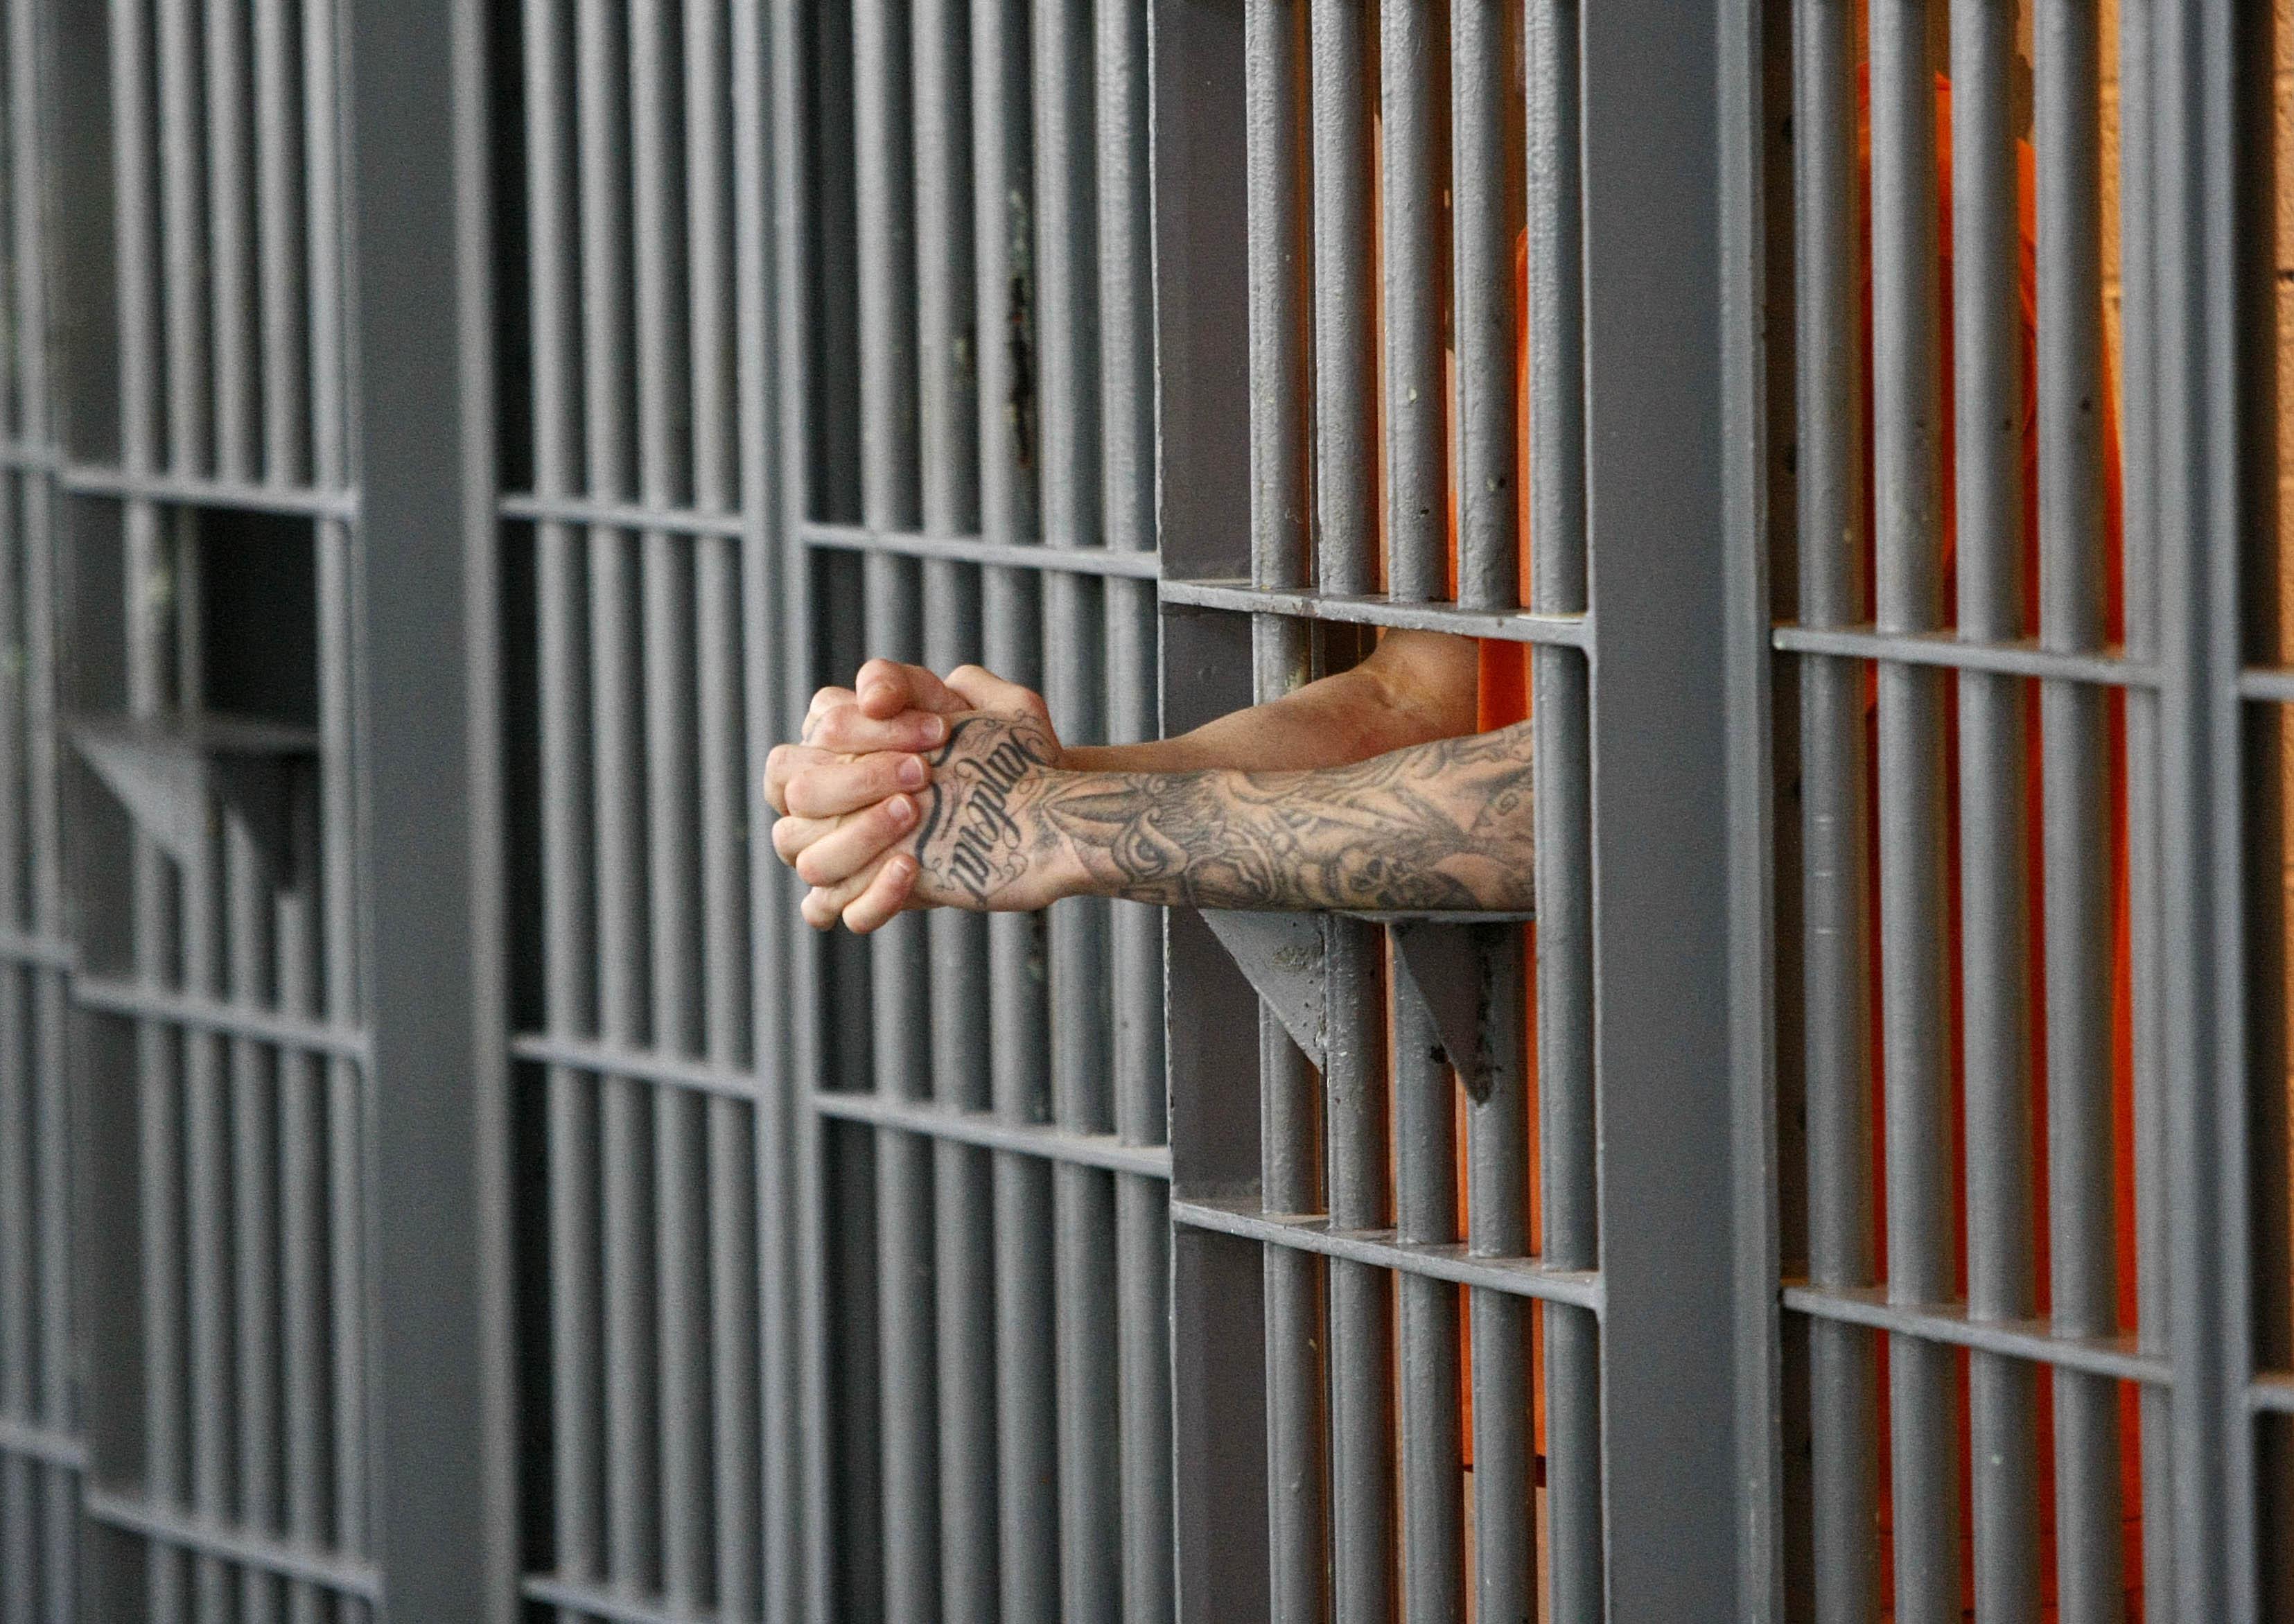 New study reveals Alabama has 5th highest incarceration rate